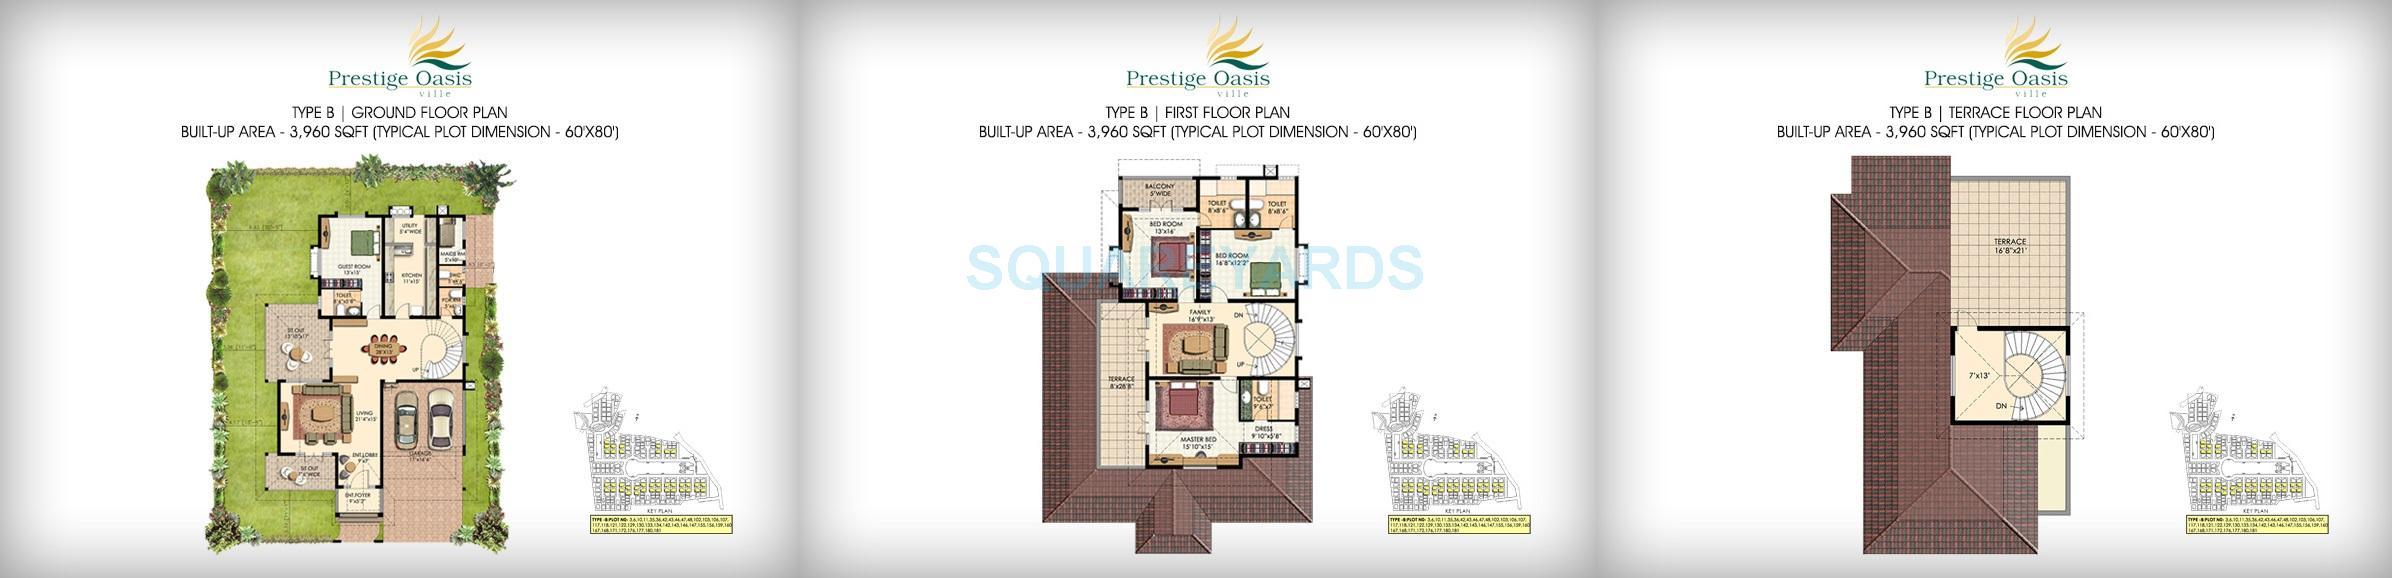 prestige oasis villa 4bhk 3960sqft1